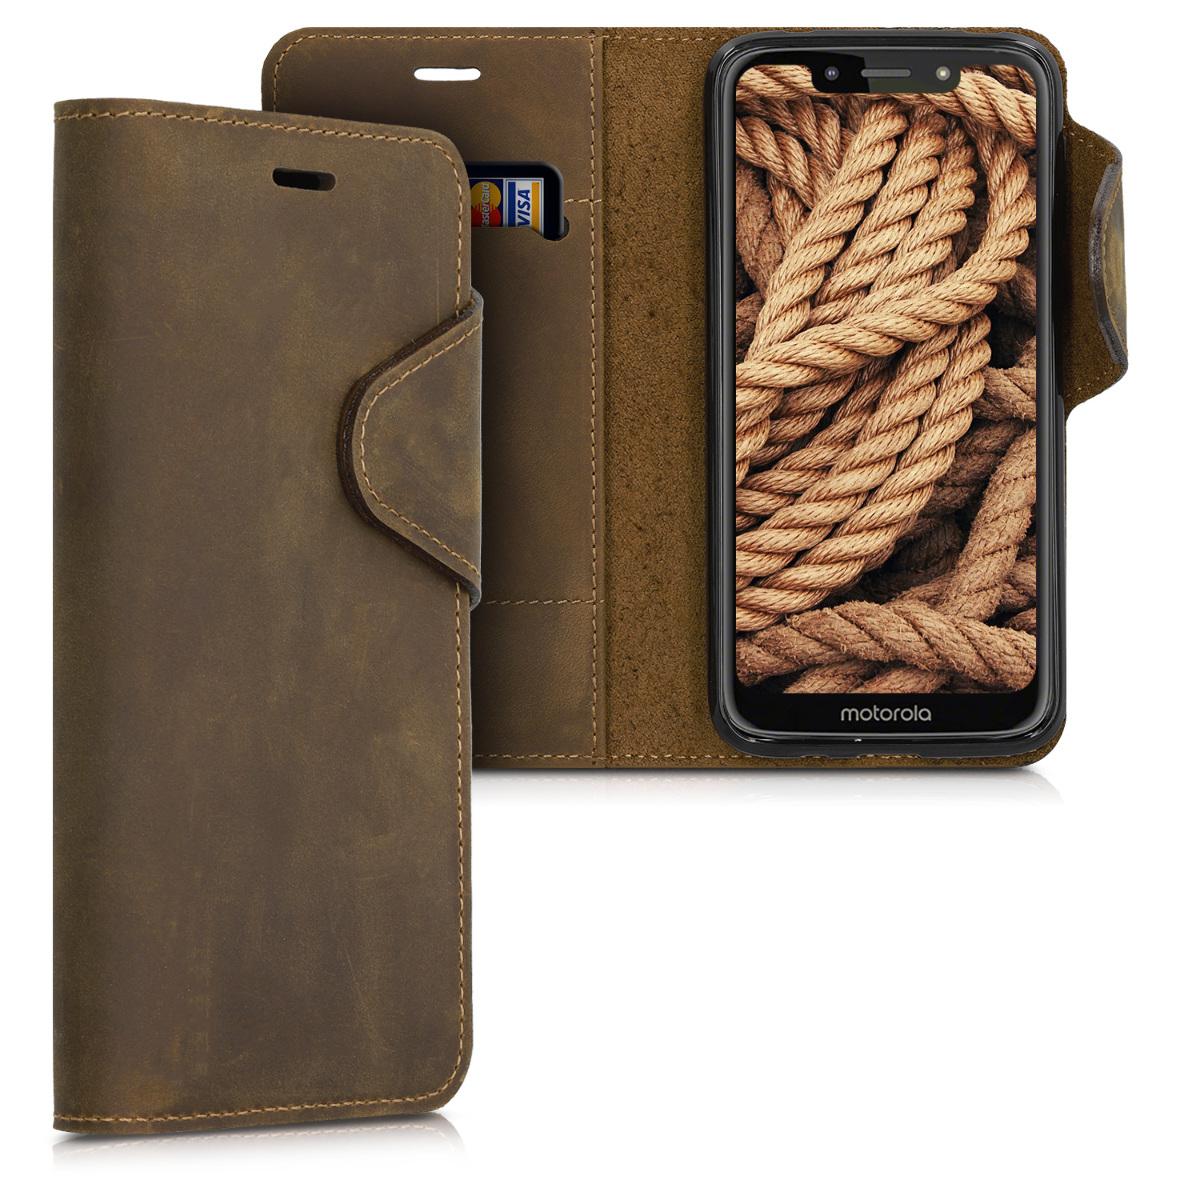 Kalibri Δερμάτινη Suede Θήκη - Πορτοφόλι Motorola Moto G7 Play - Brown ( 49297.05 )